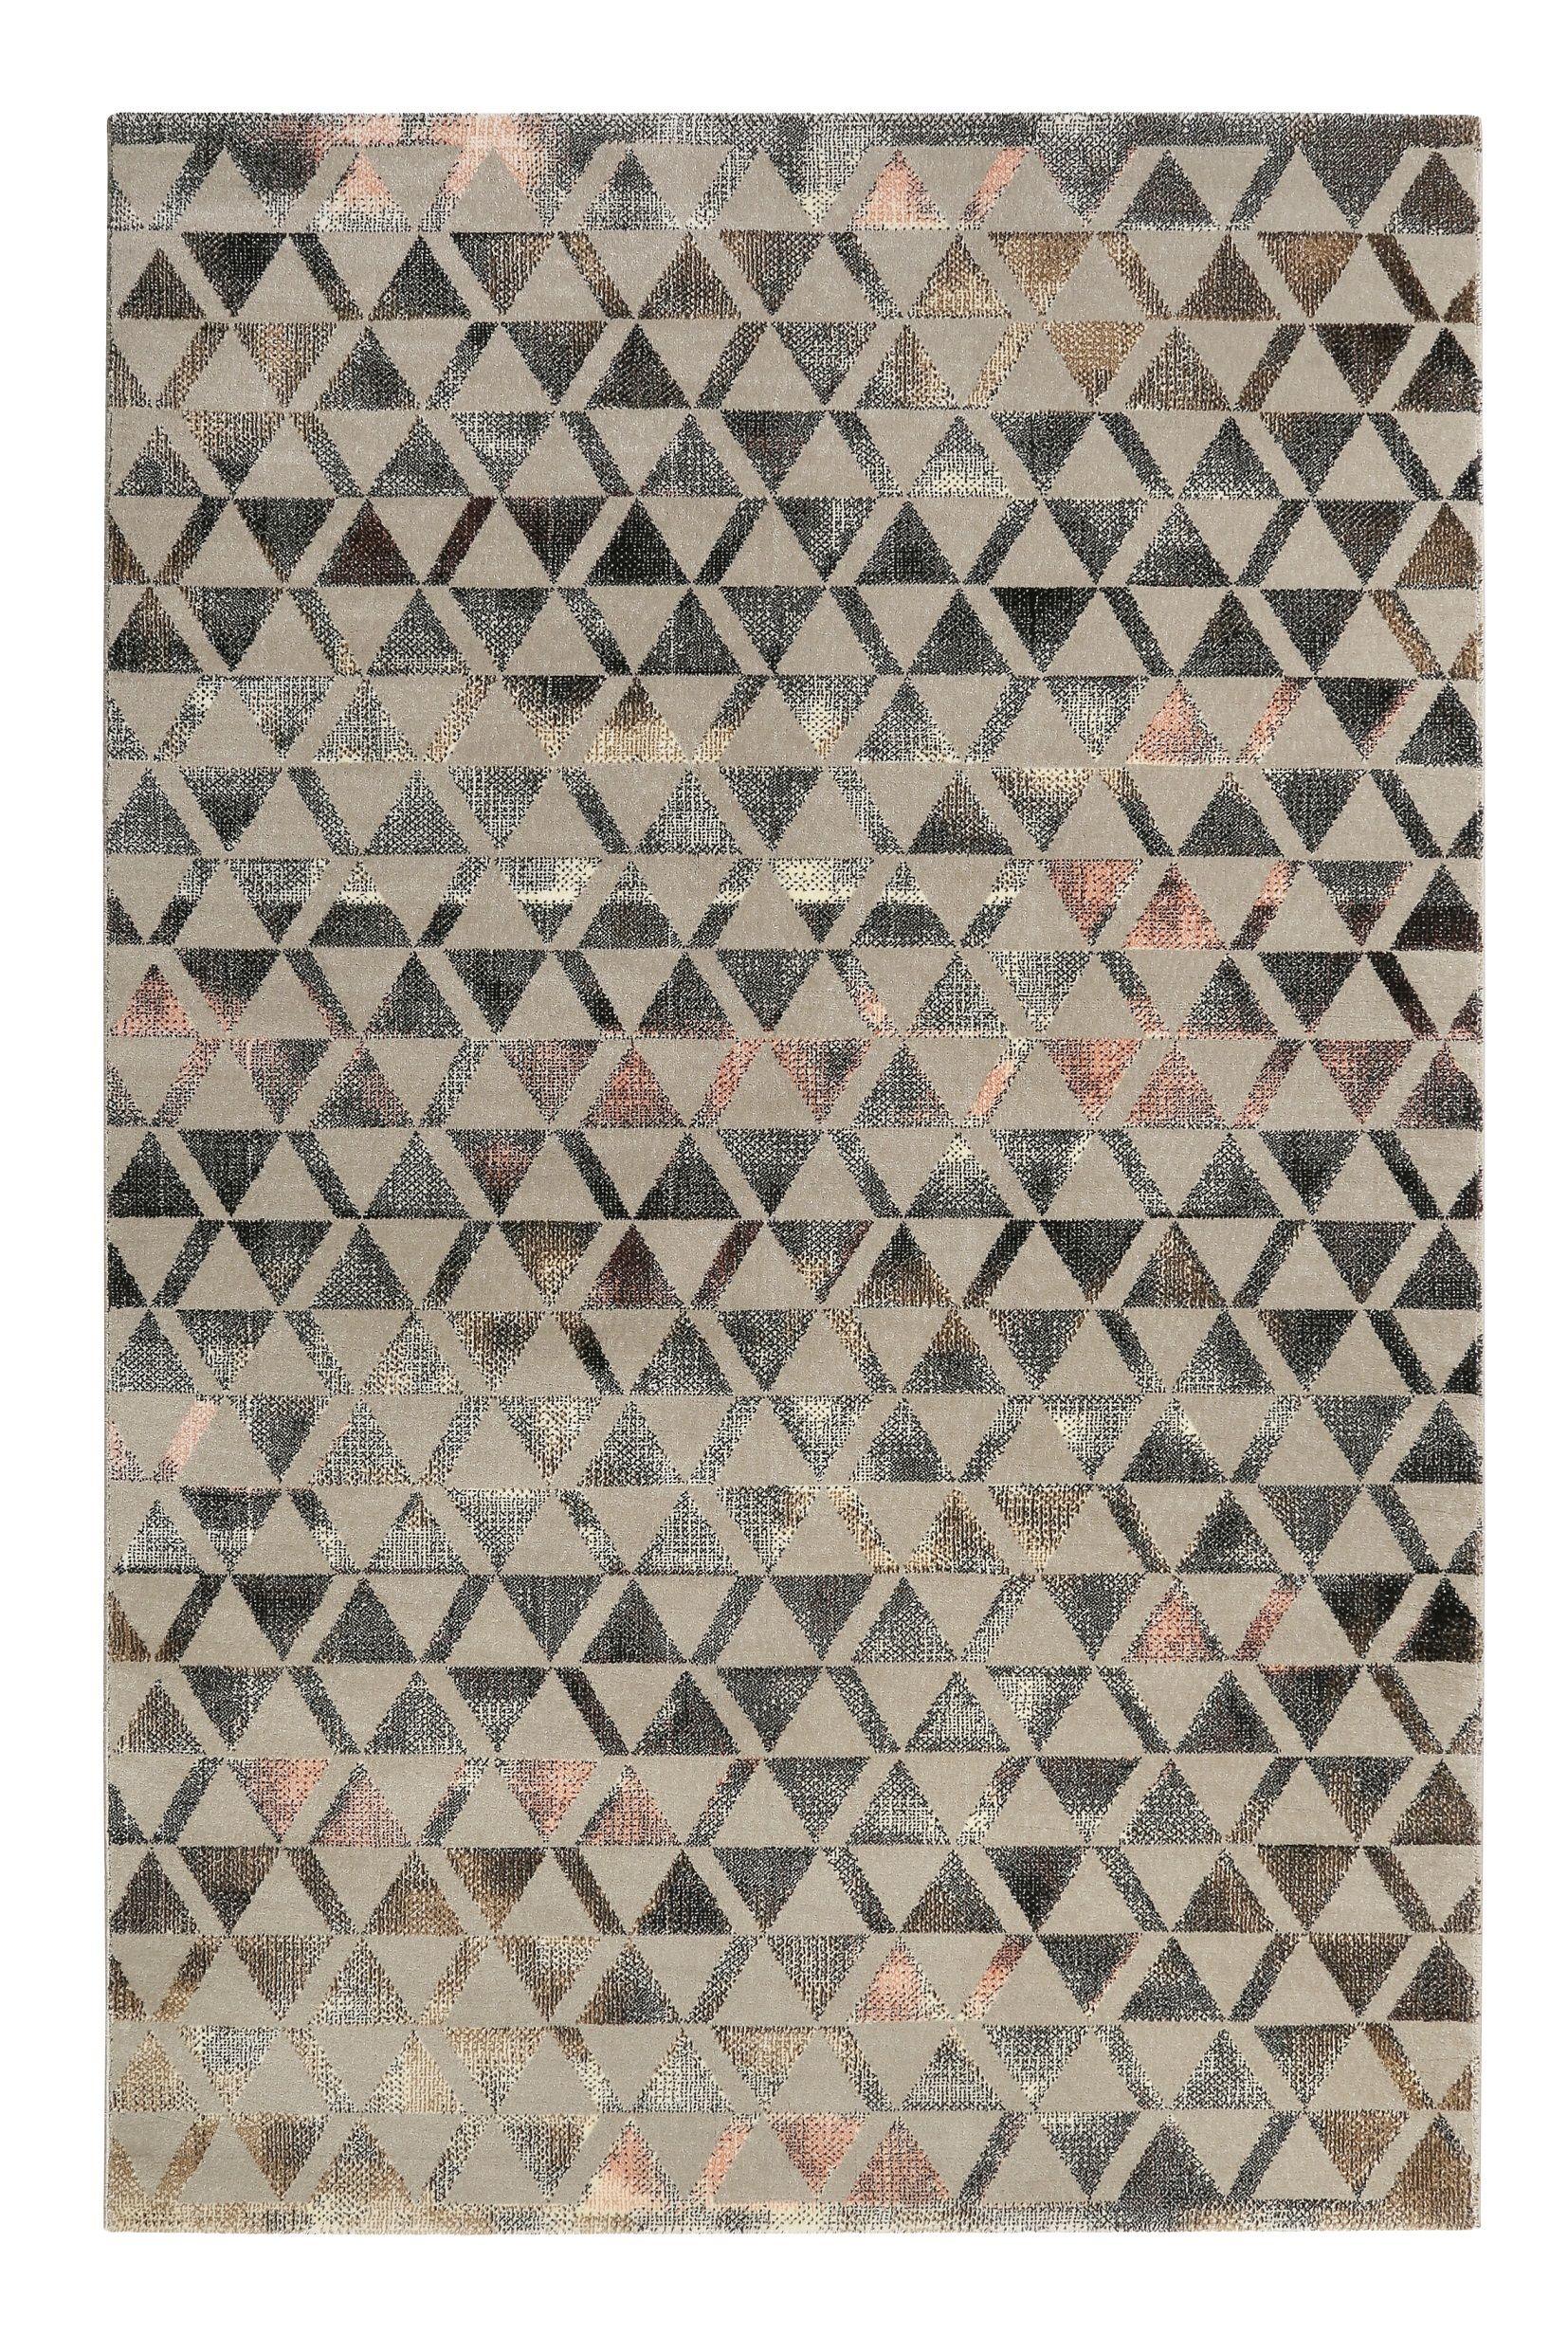 Teppich Grau Schwarz Rosa Kurzflor Pearl 2 Weconhome Kurzflor Teppiche Teppich Teppich Grau